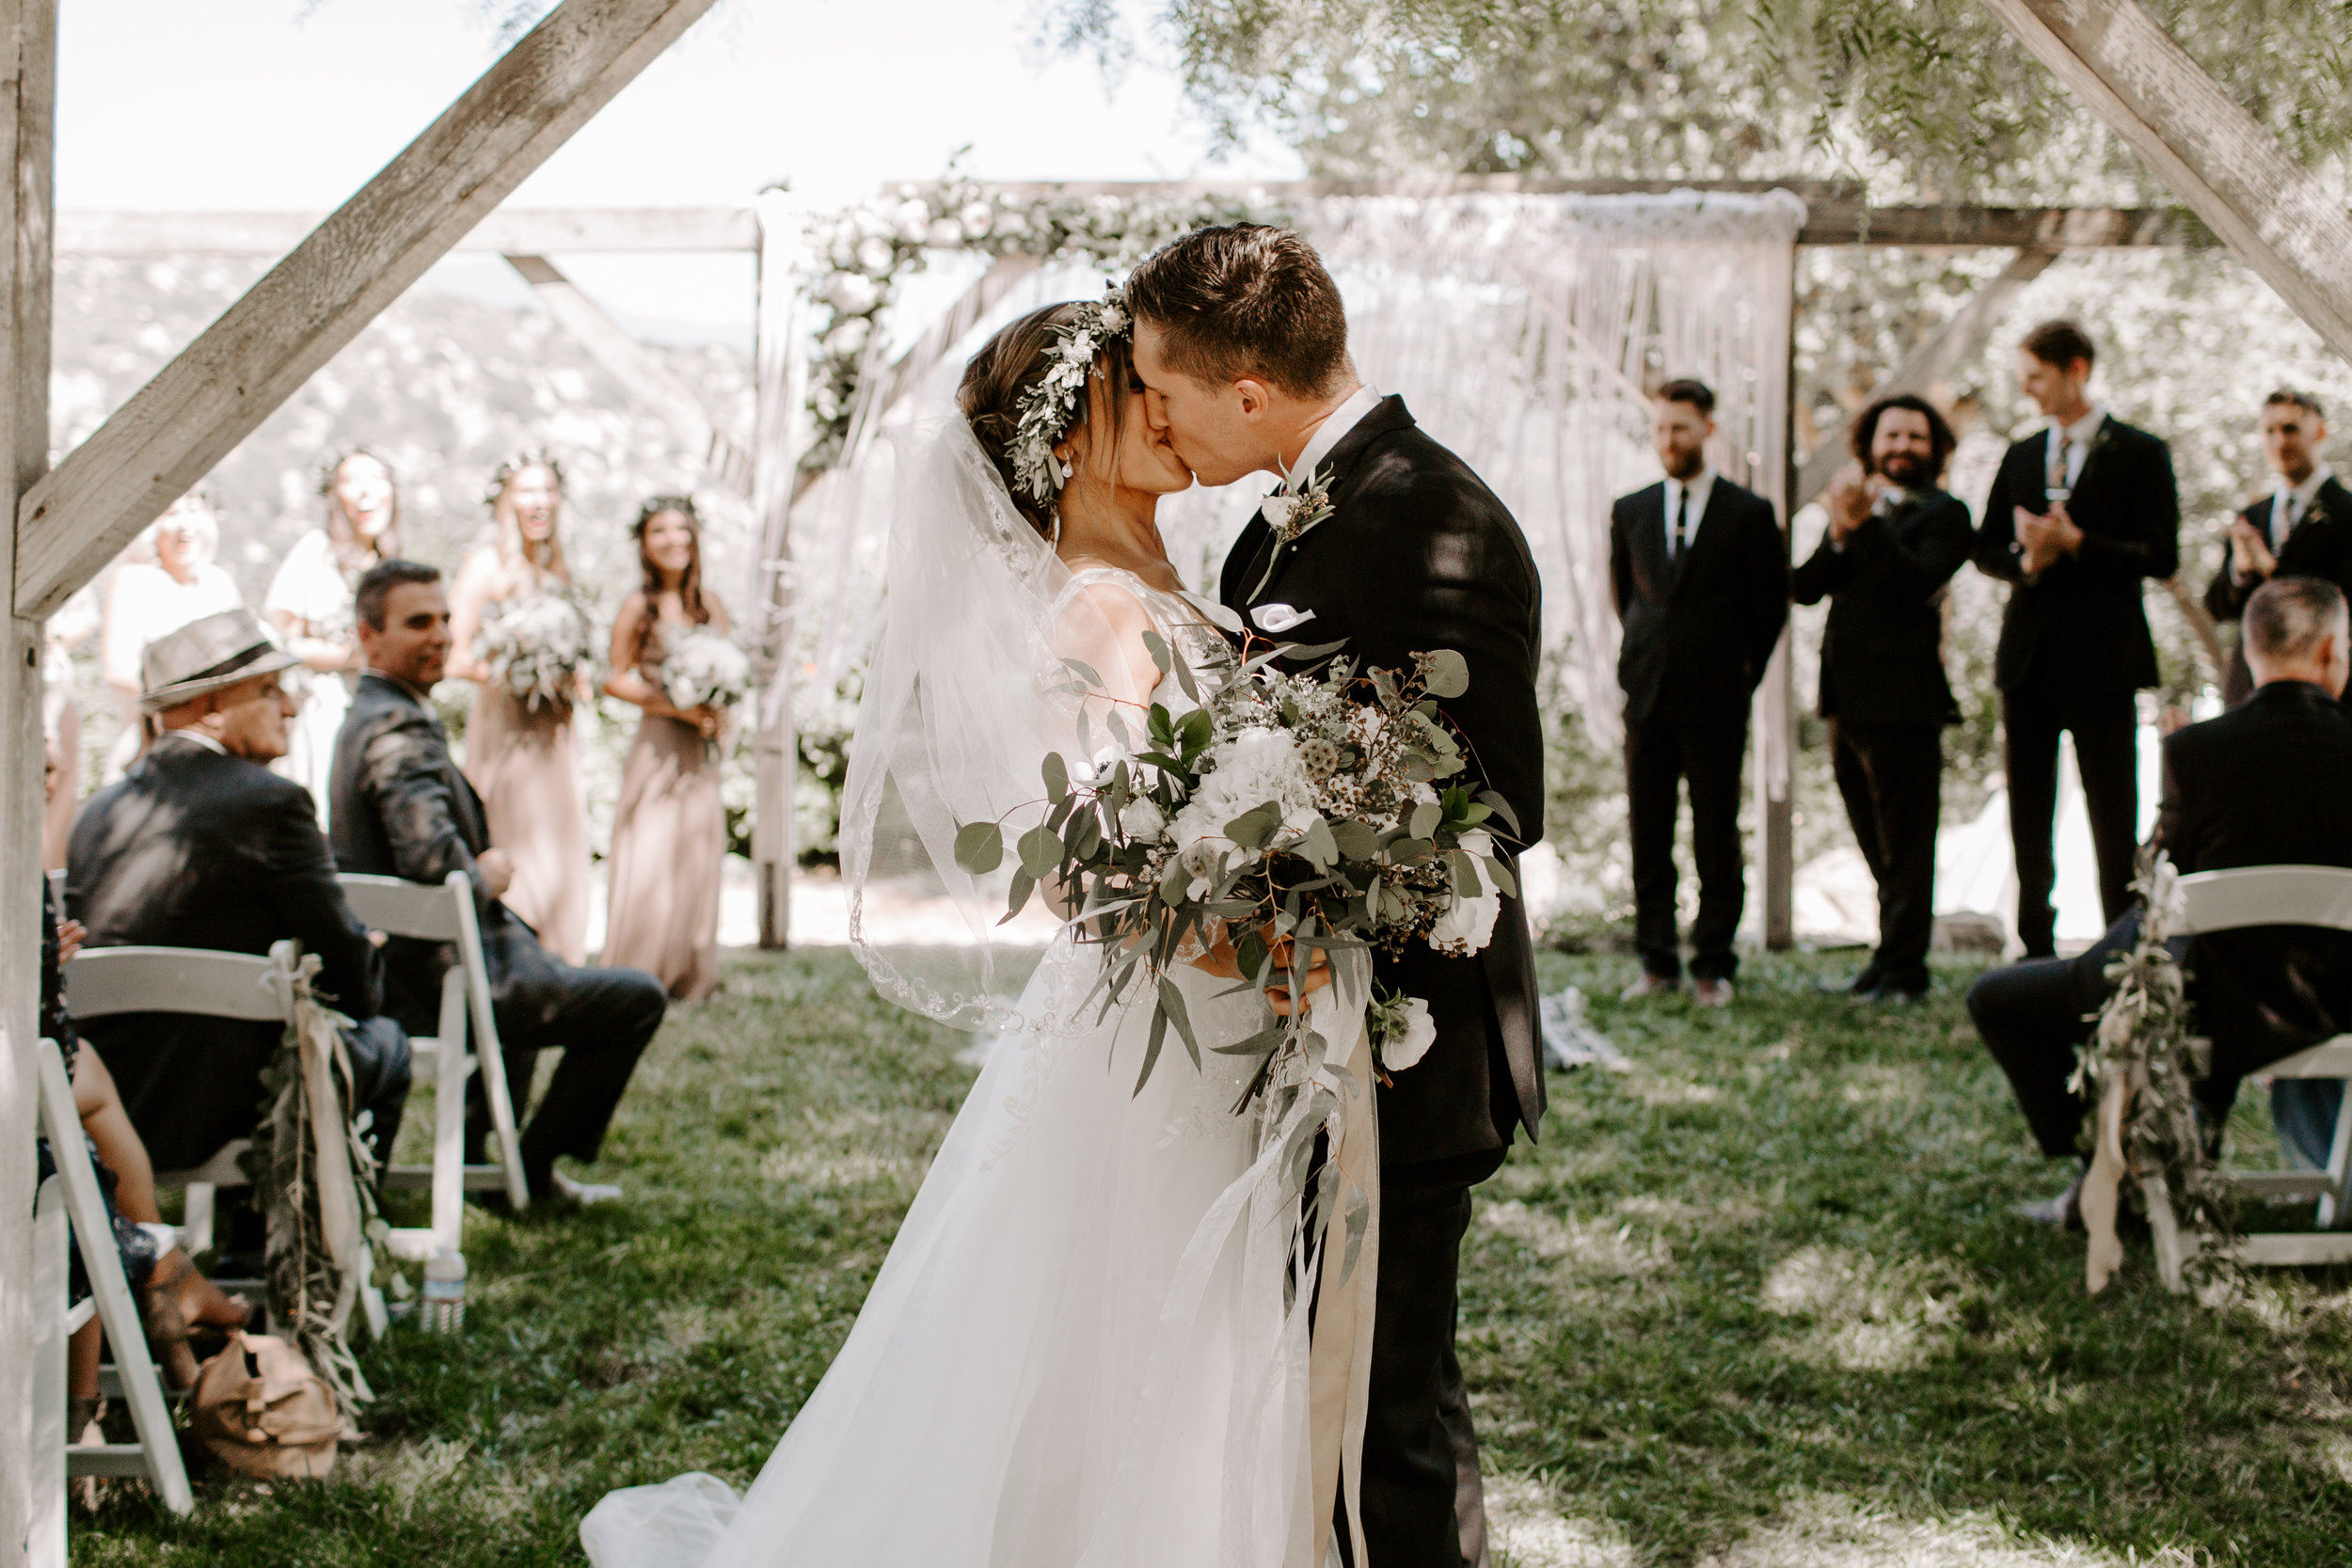 kate+zack_wedding_secludedgardenestate_temecula_madisonrylee_0397.jpg